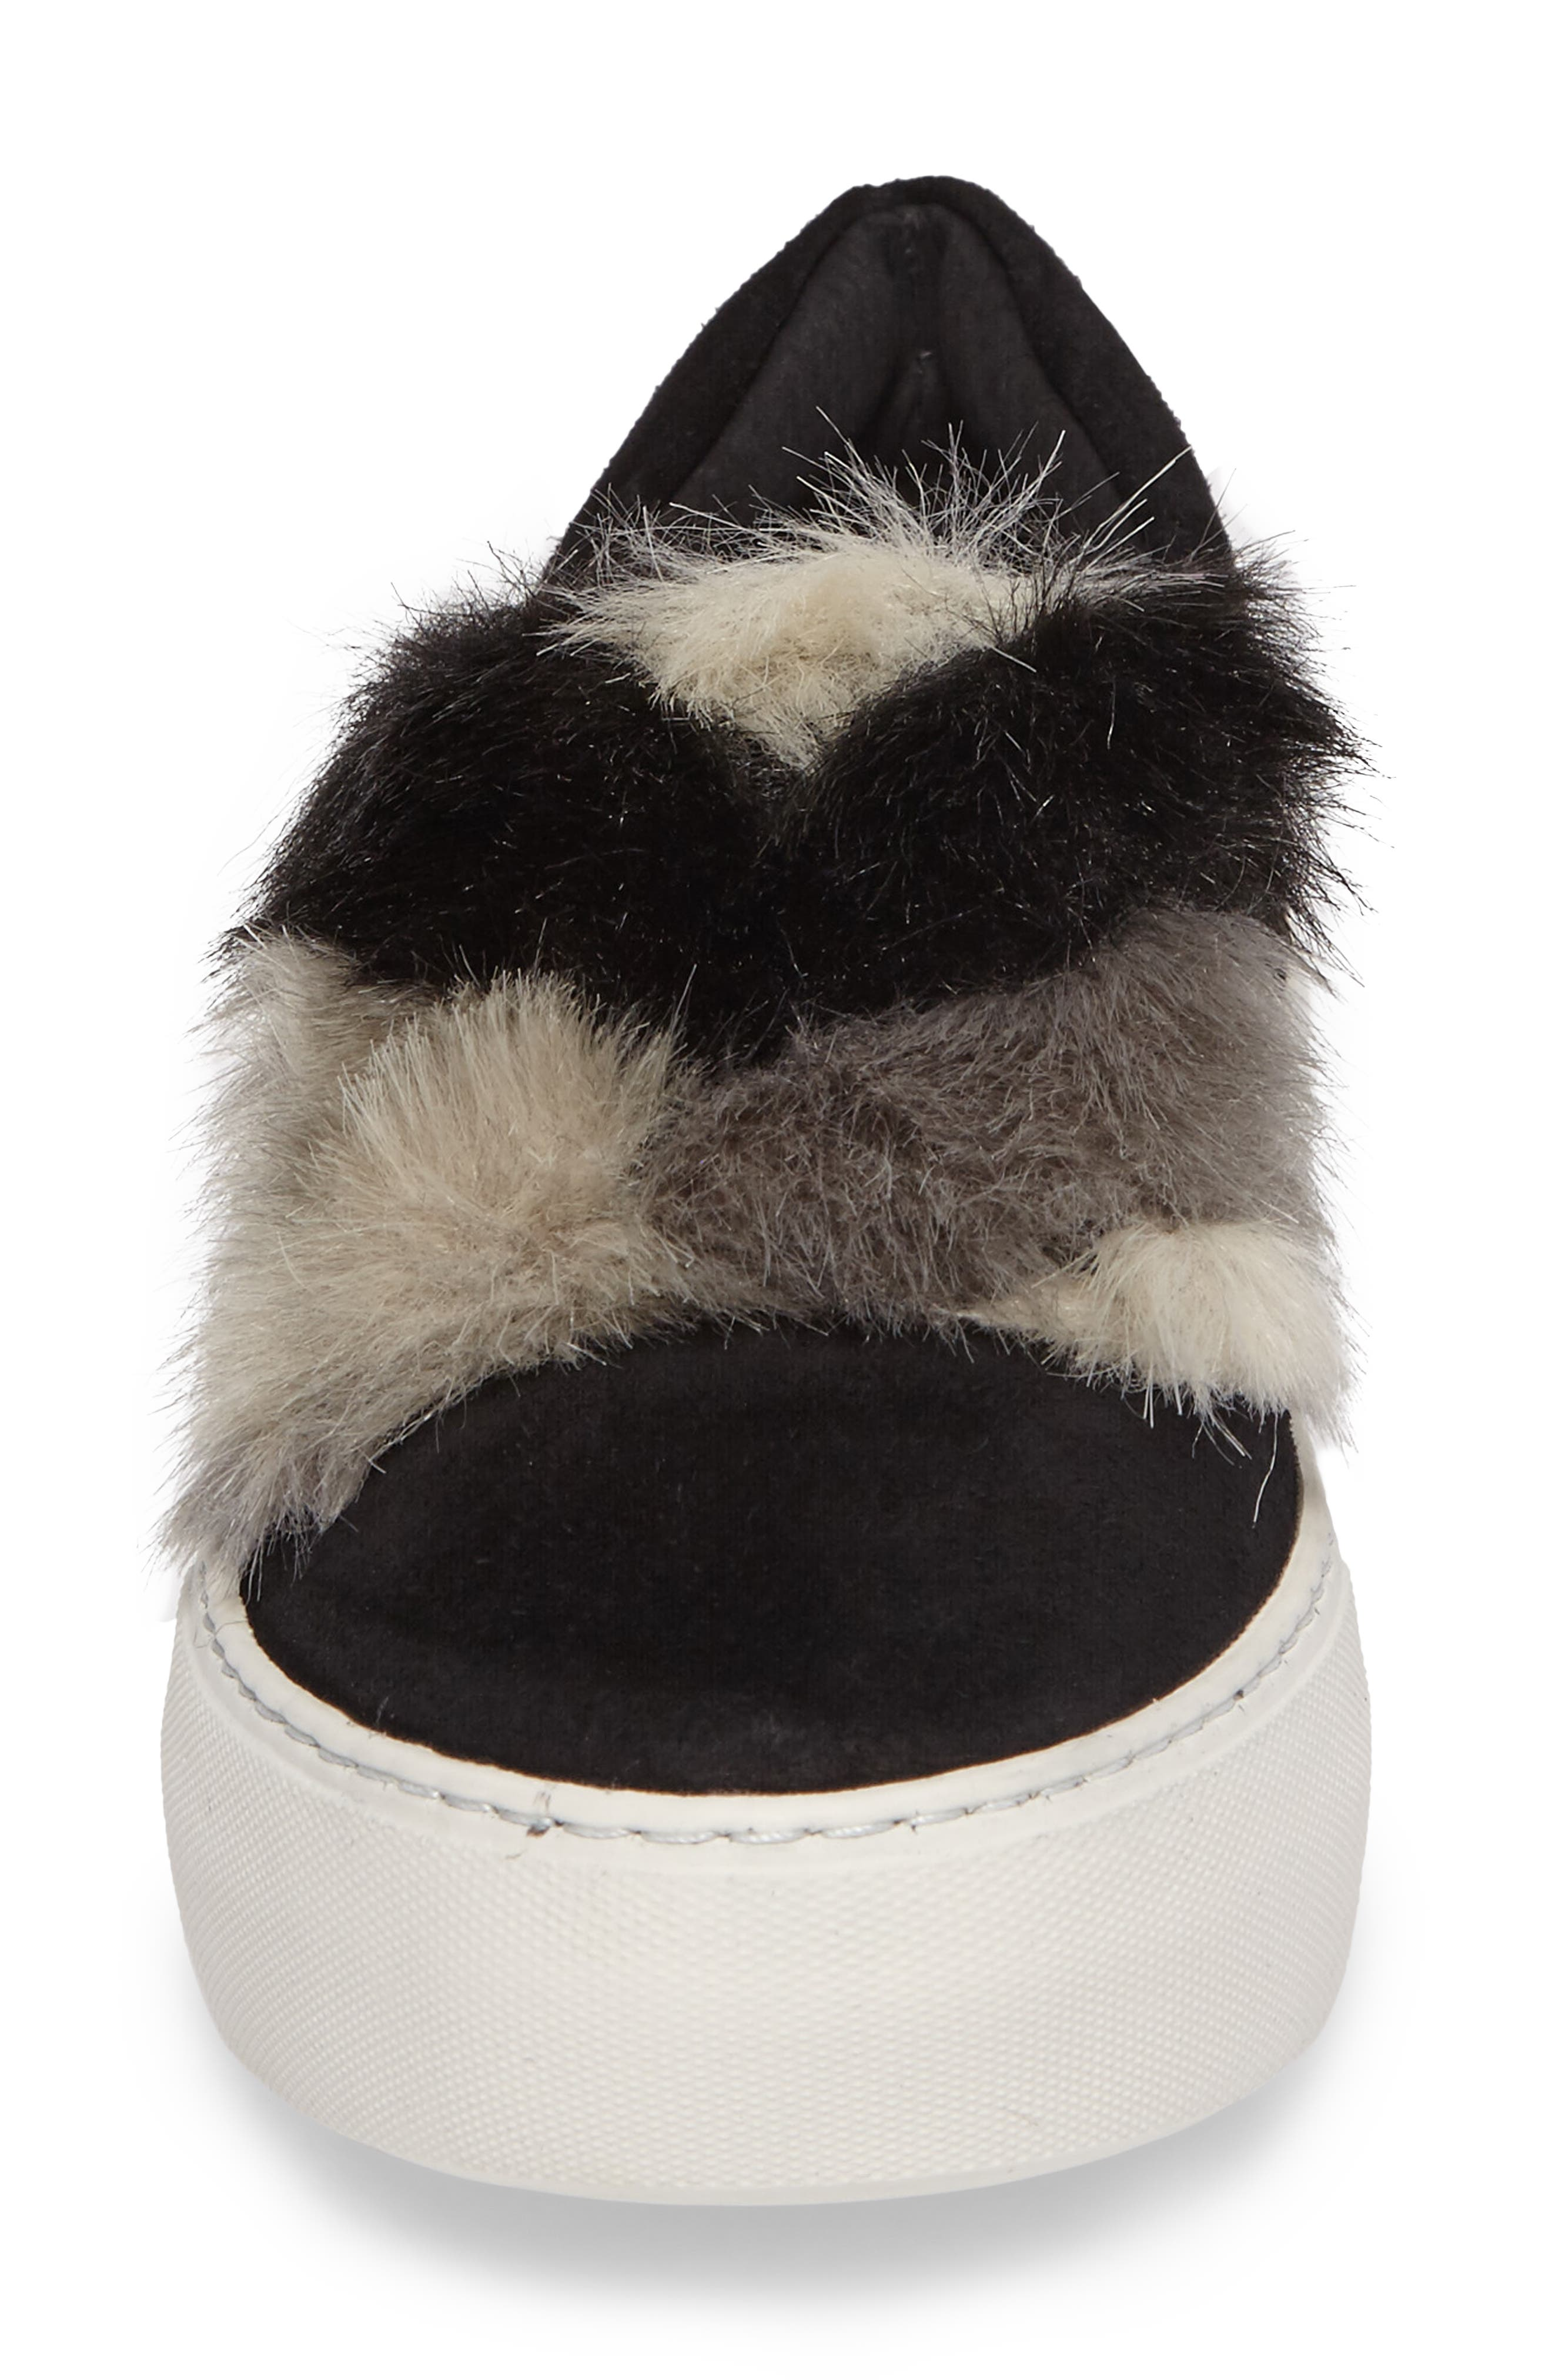 Alexi Faux Fur Slip-On Sneaker,                             Alternate thumbnail 4, color,                             002